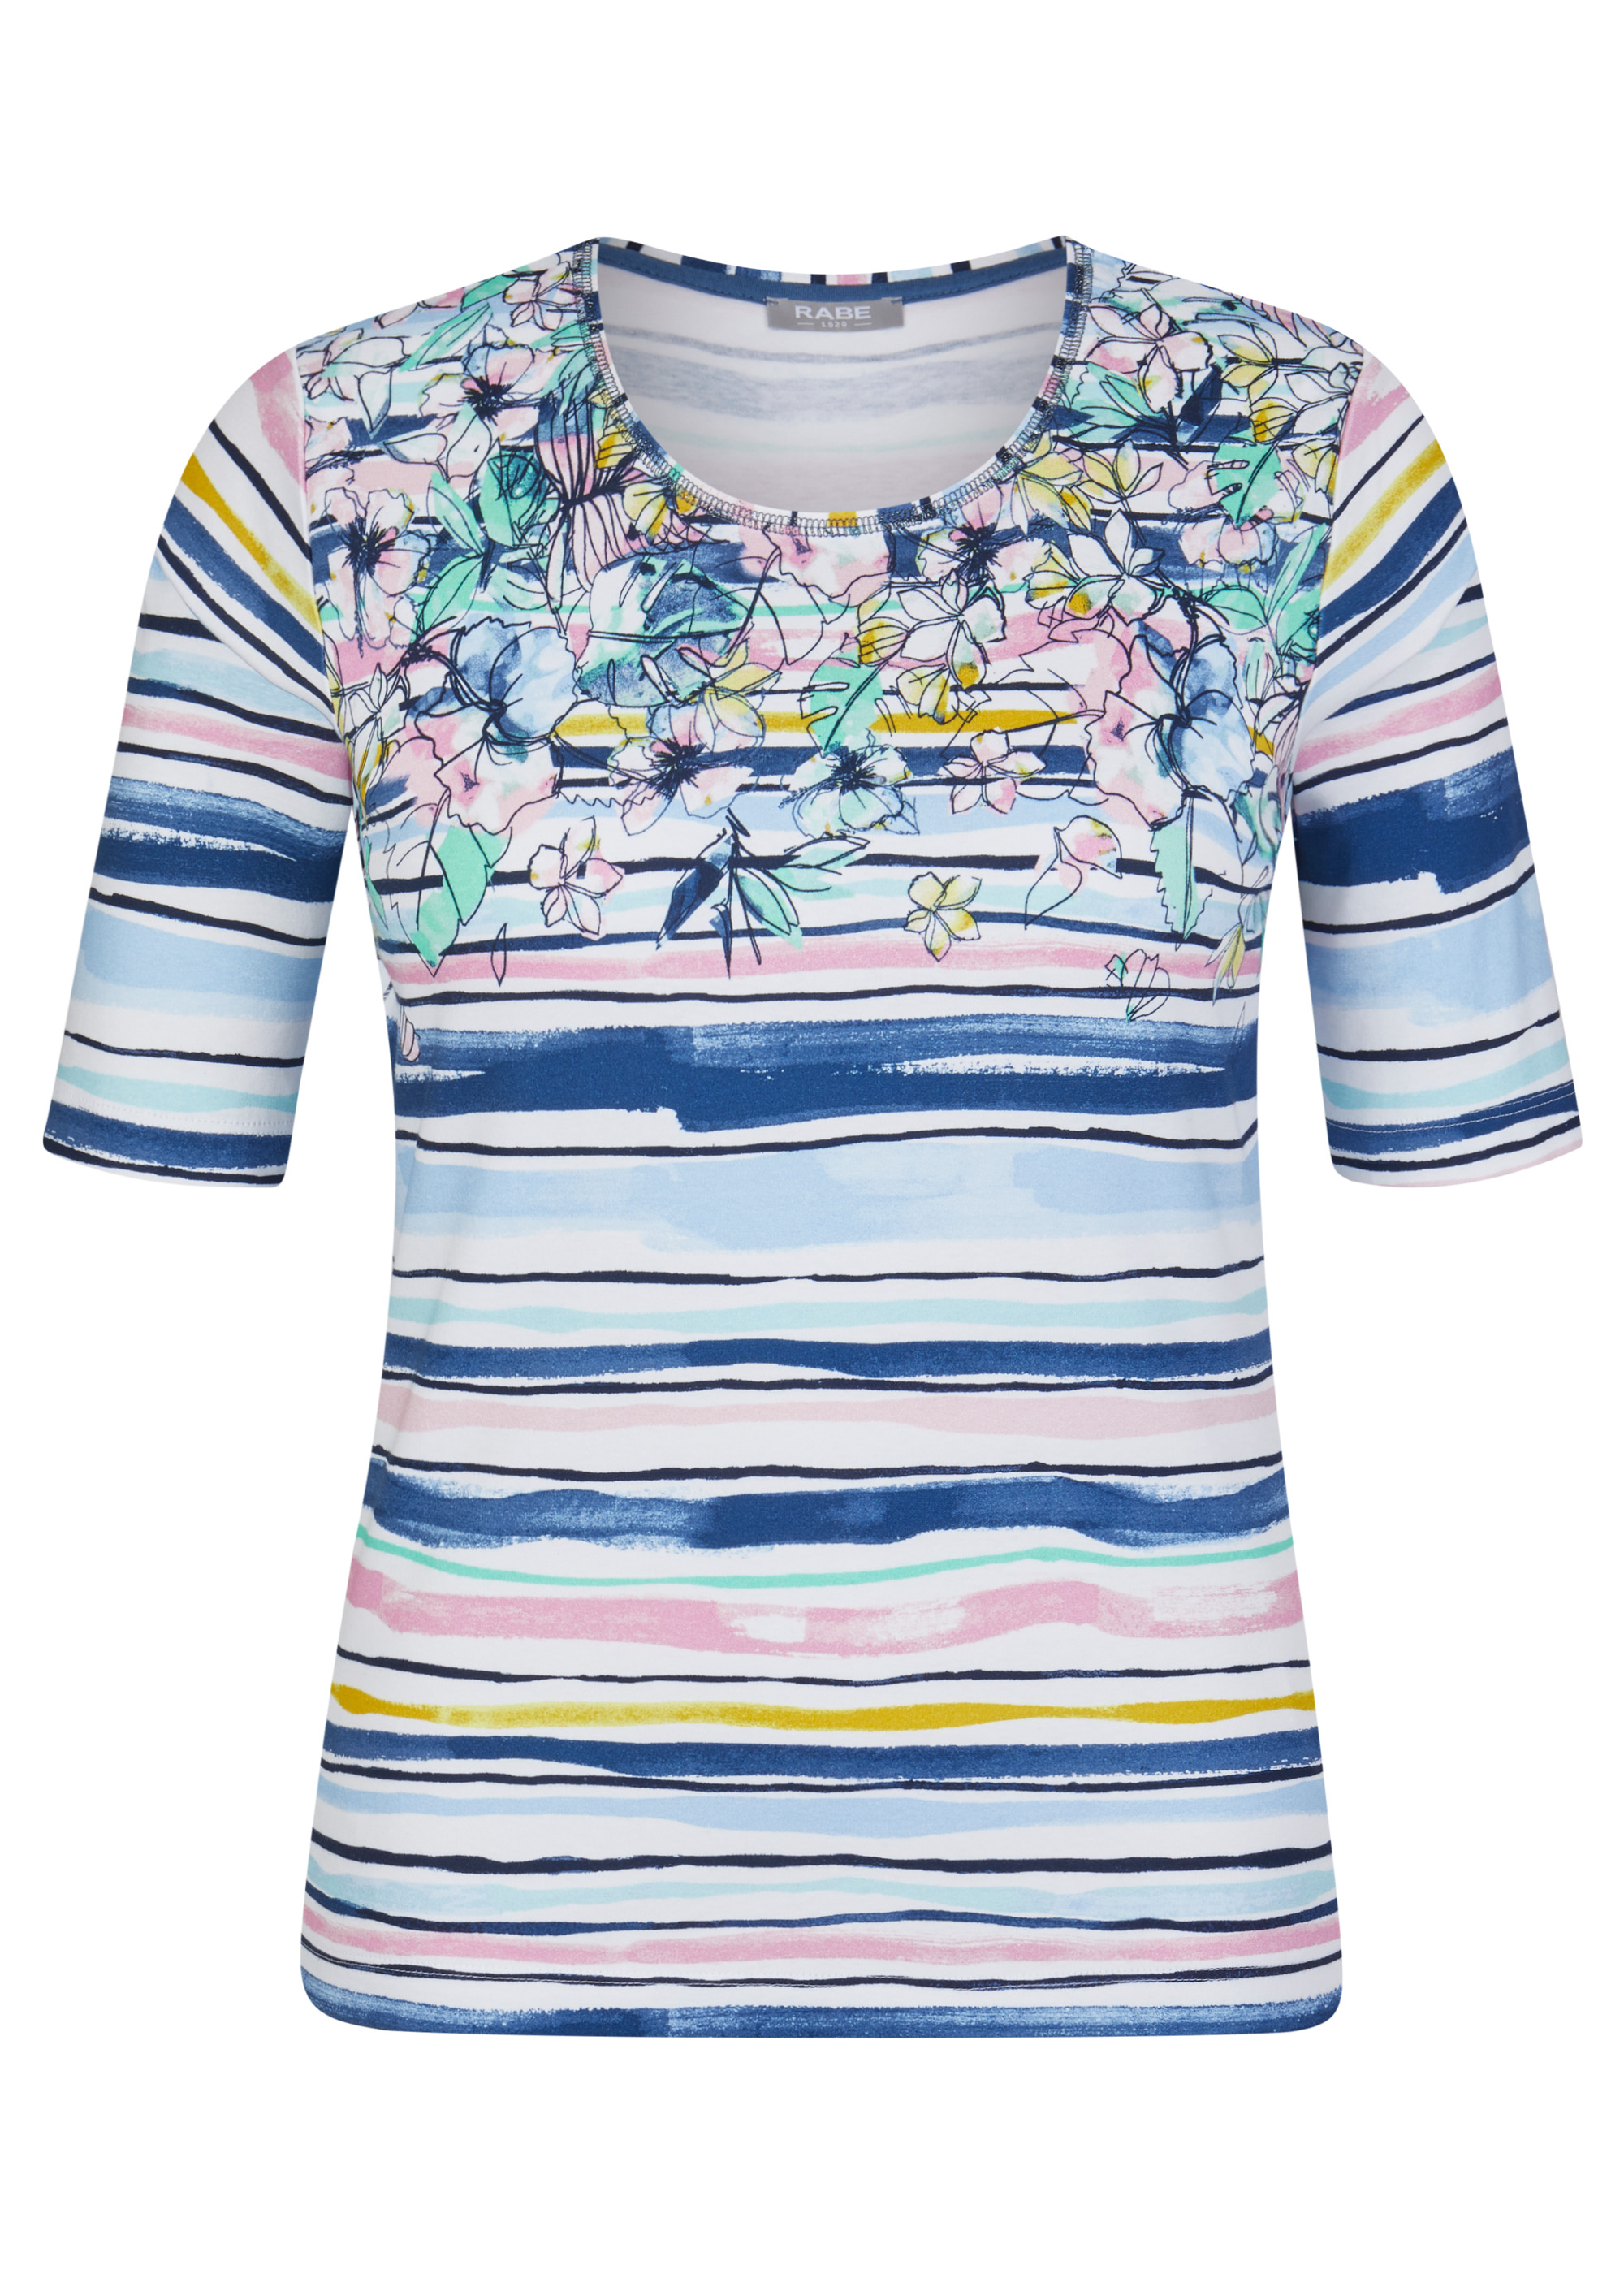 Rabe halbarm Shirt blau gestrieft